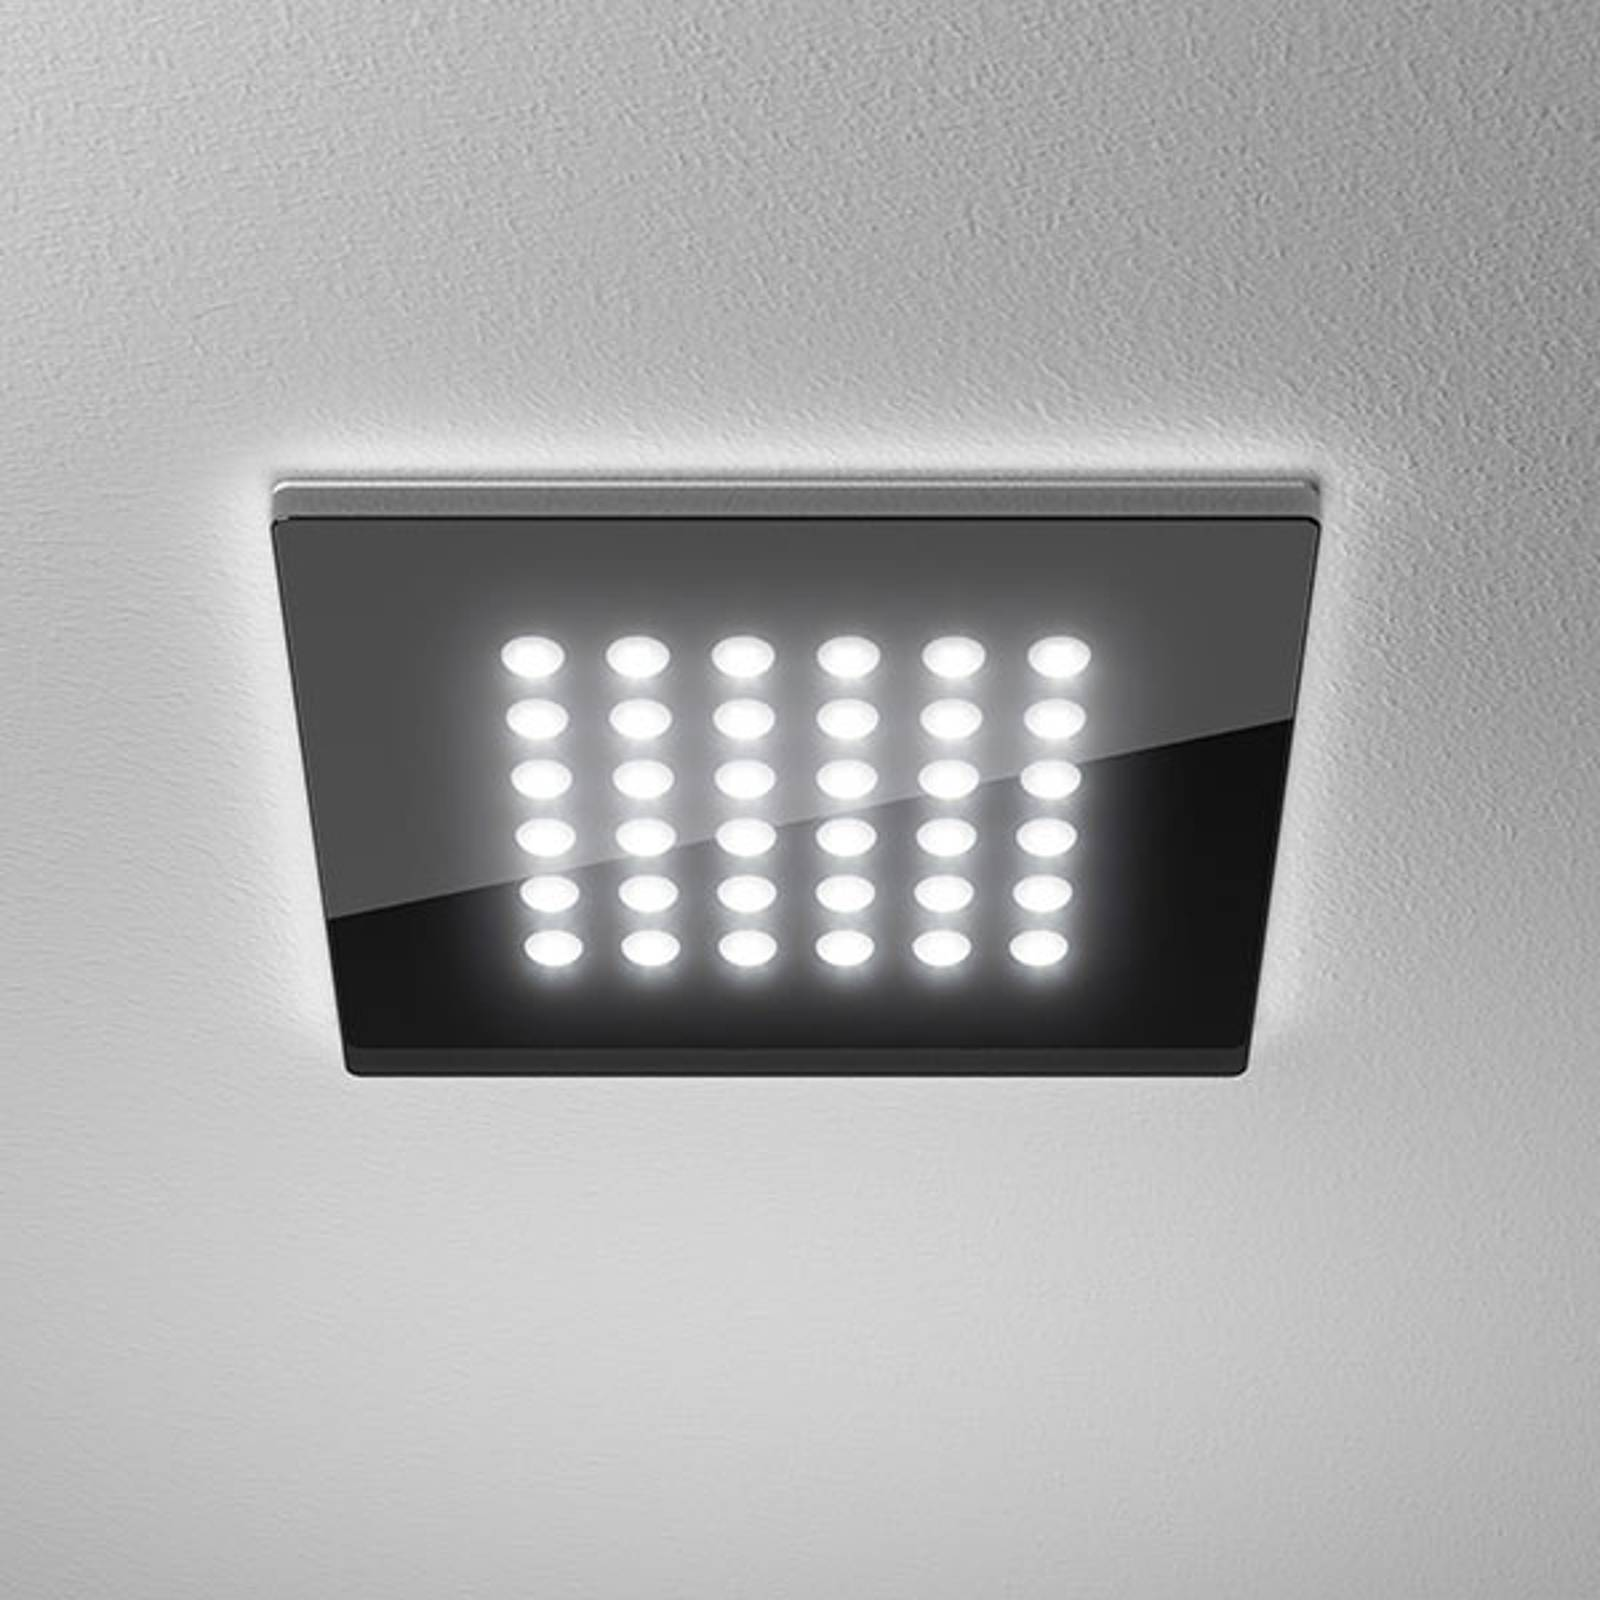 LED downlight Domino Flat Square, 16 x 16 cm, 11 W